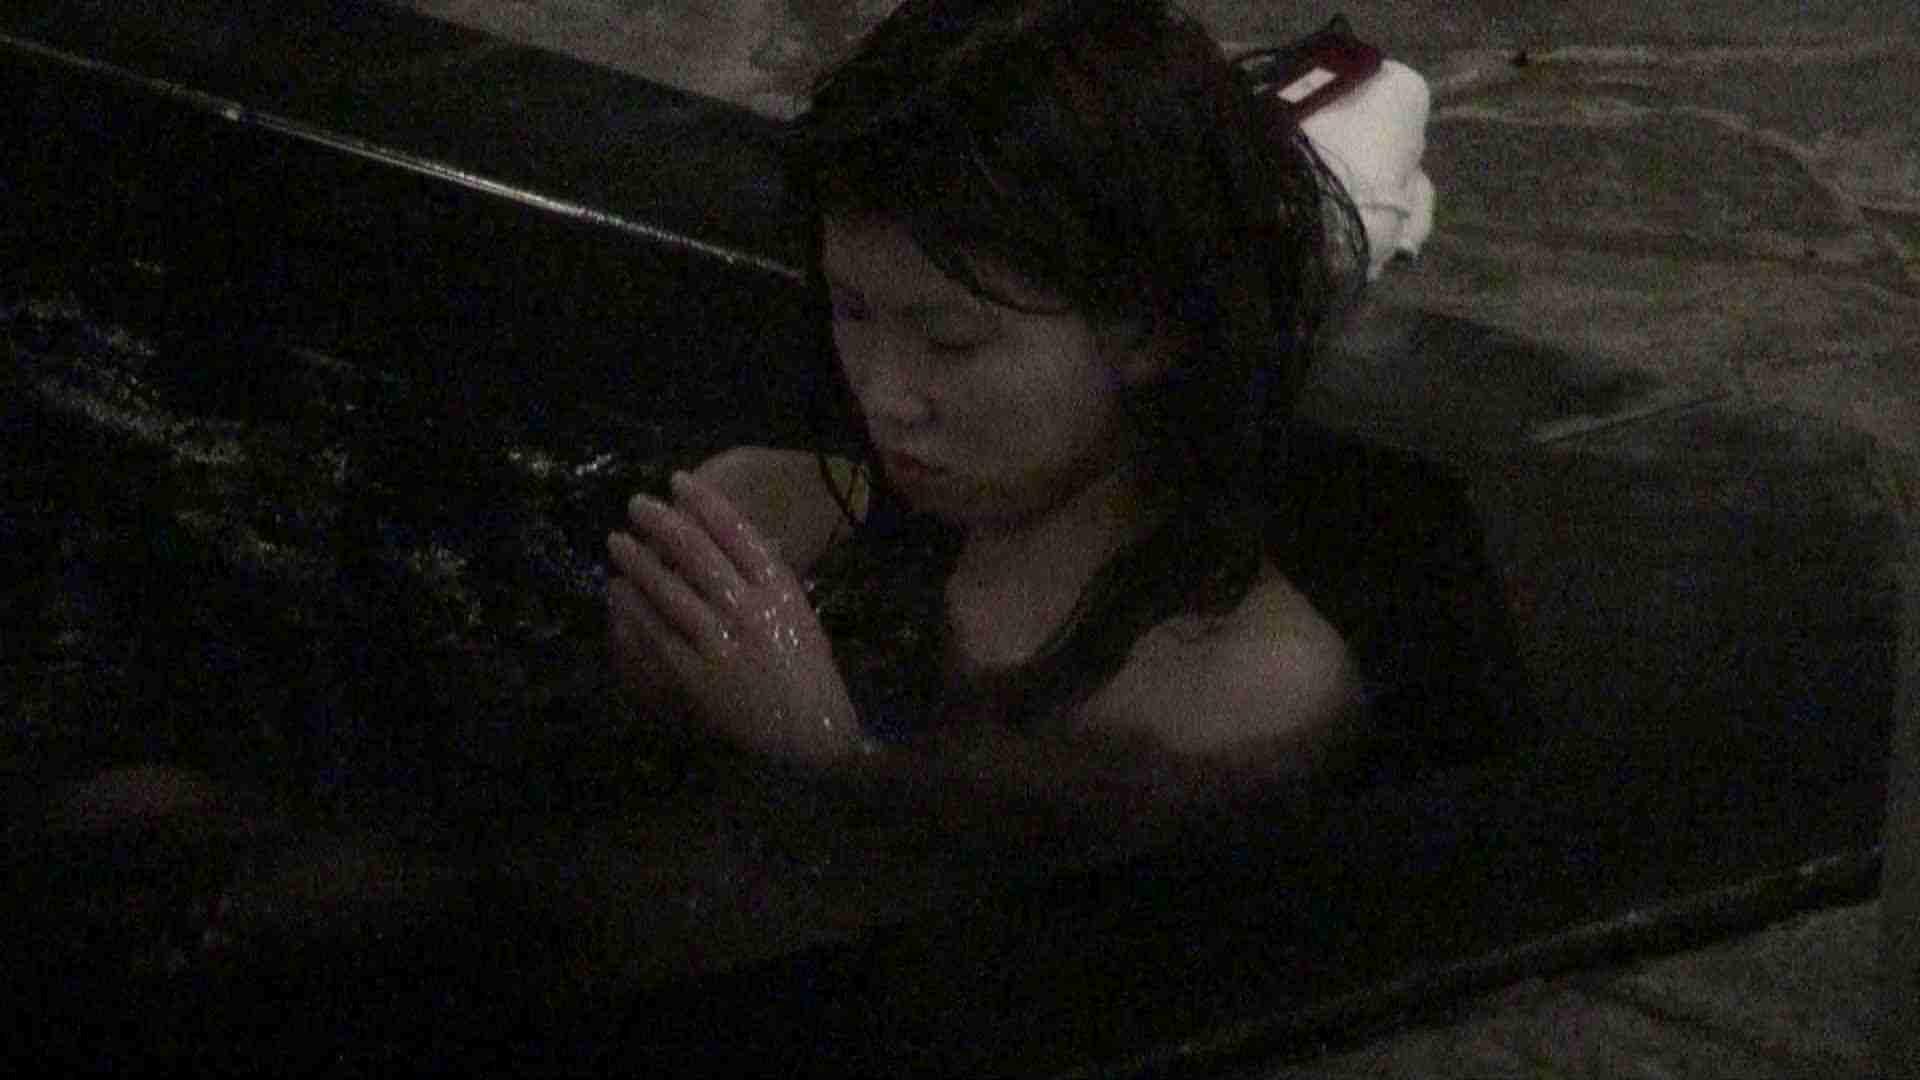 Aquaな露天風呂Vol.371 露天 スケベ動画紹介 94枚 89